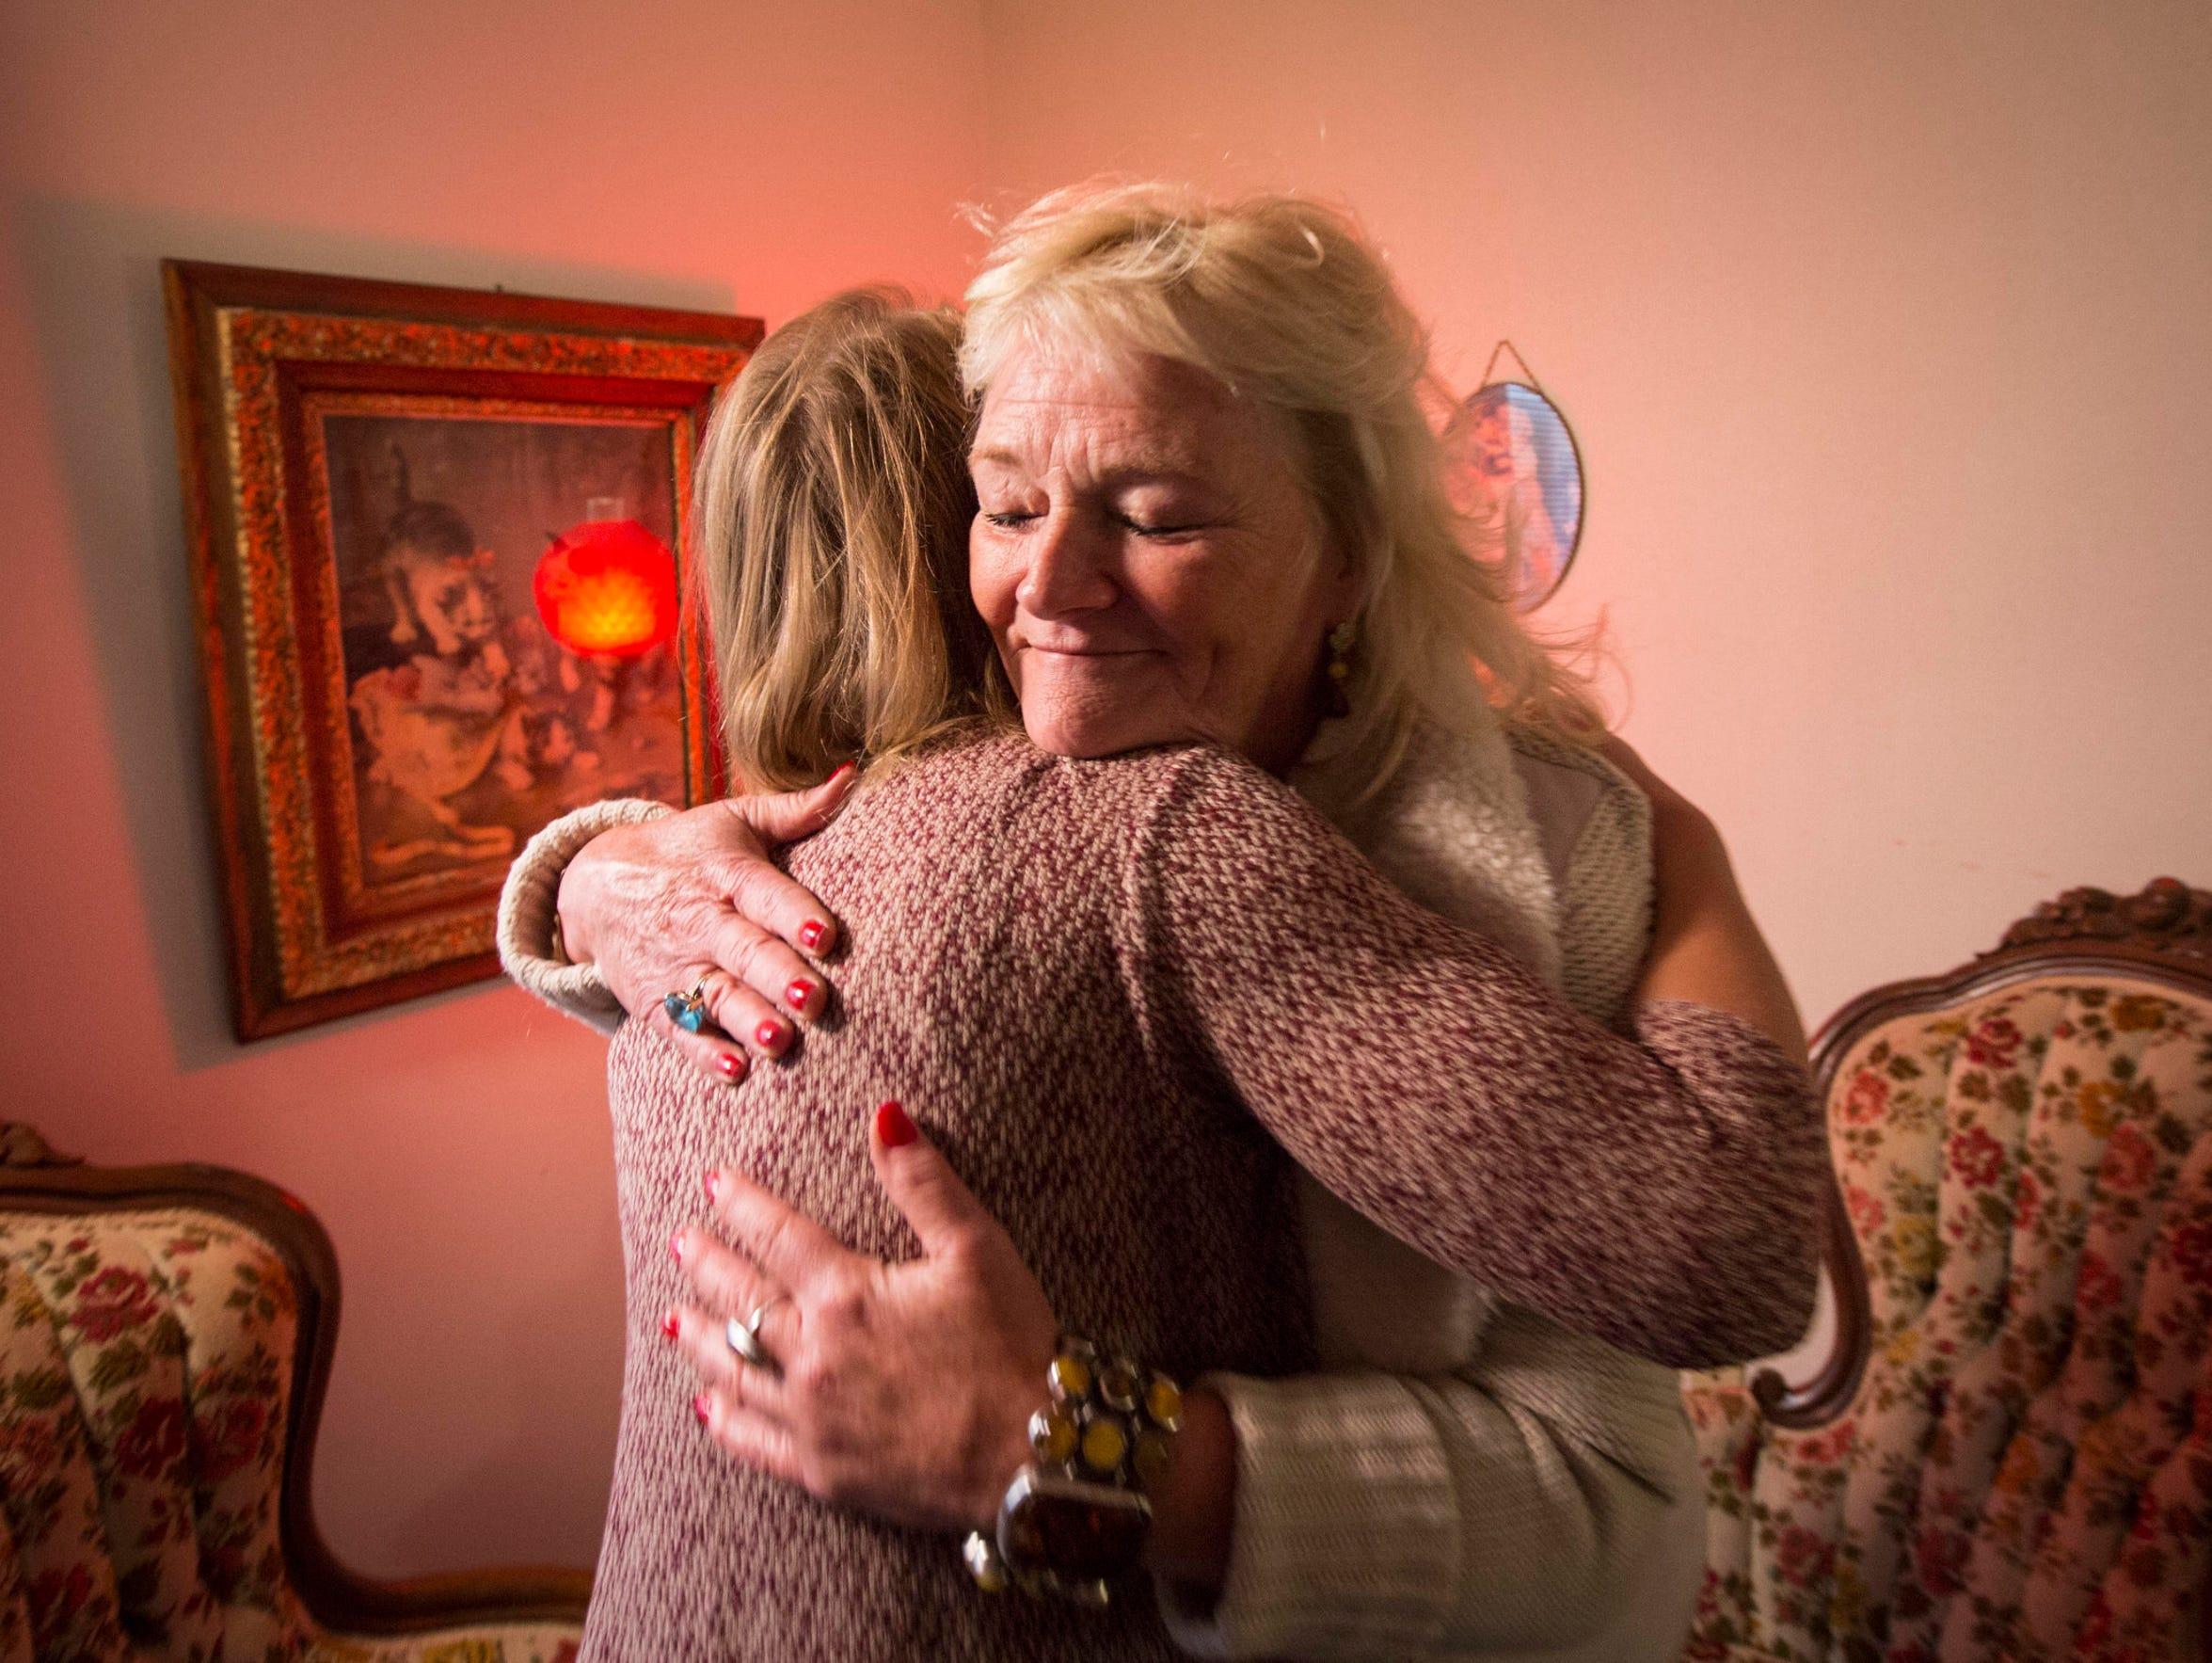 Medium Janine Ambrose gives a hug to Kristi Beyer of